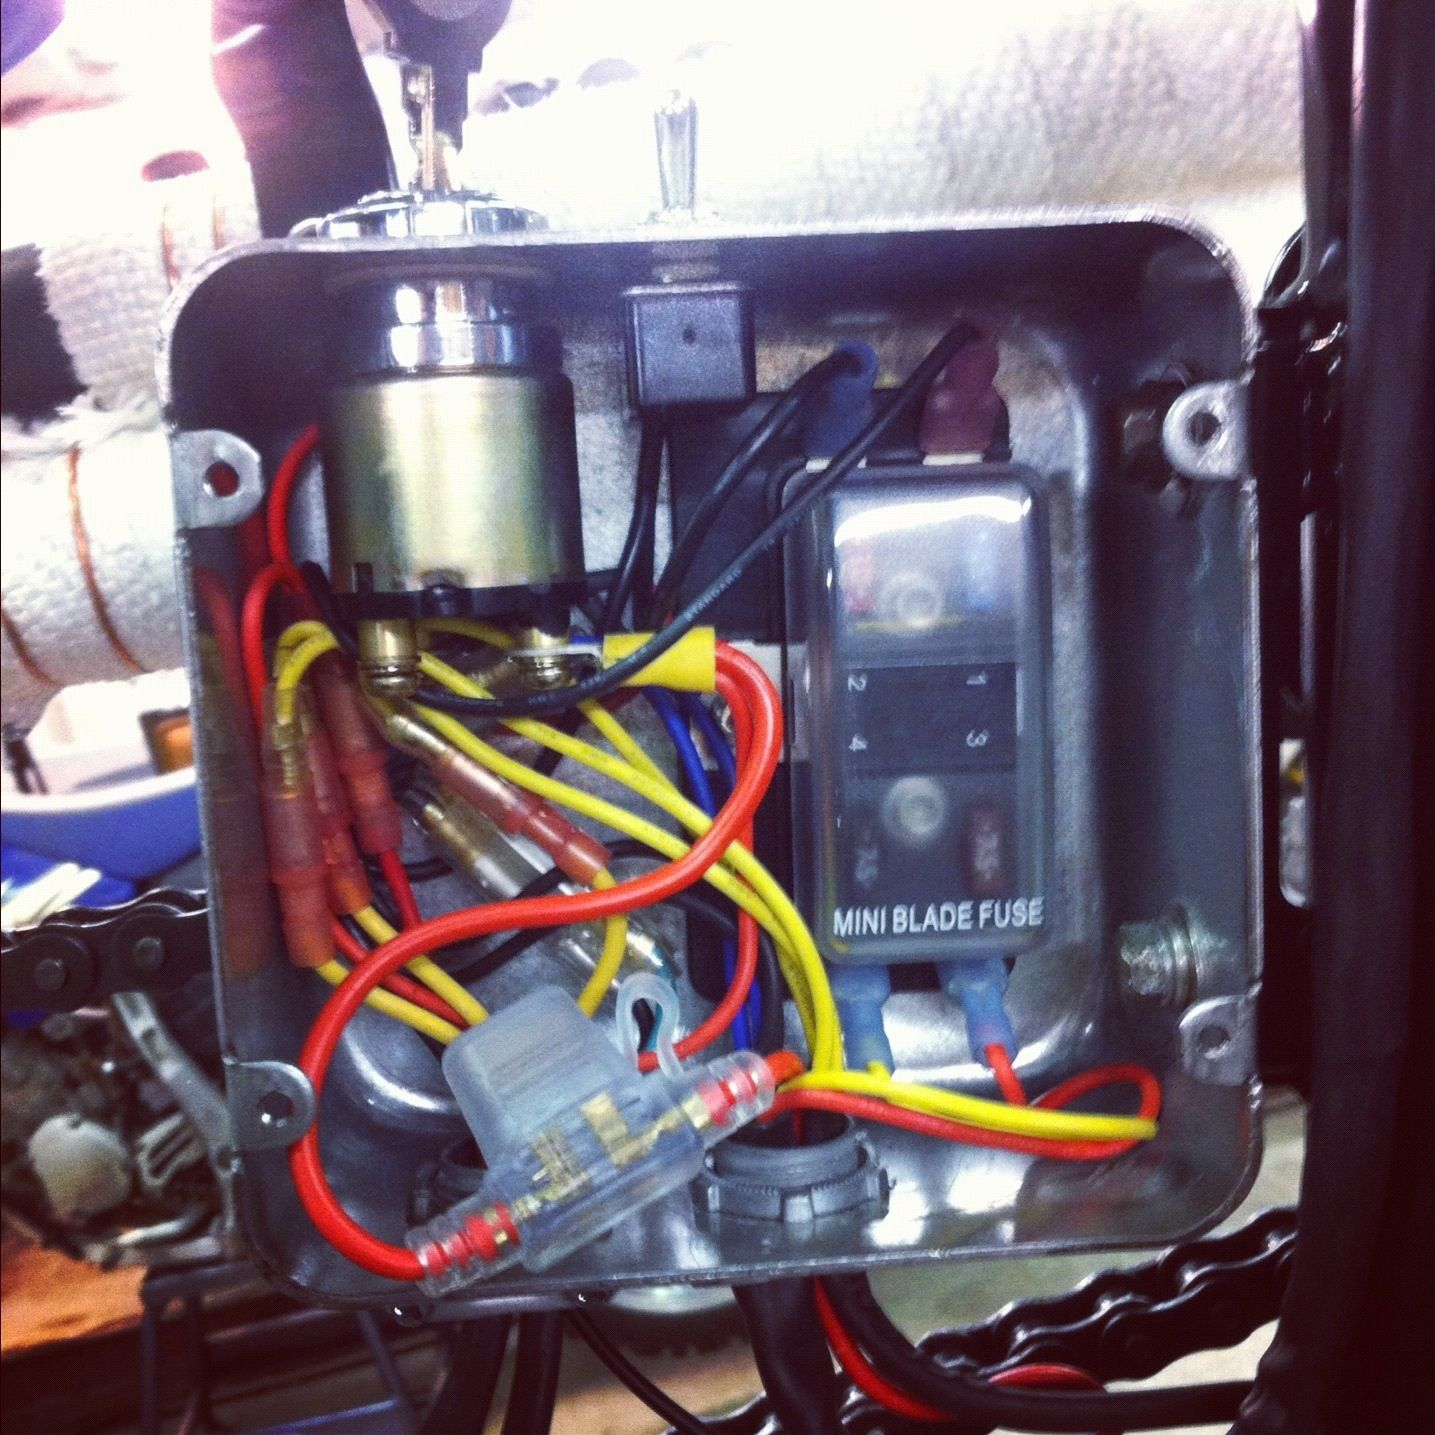 xs650 bobber wiring diagram gibson les paul diagrams 10 electronics box motorcycles pinterest